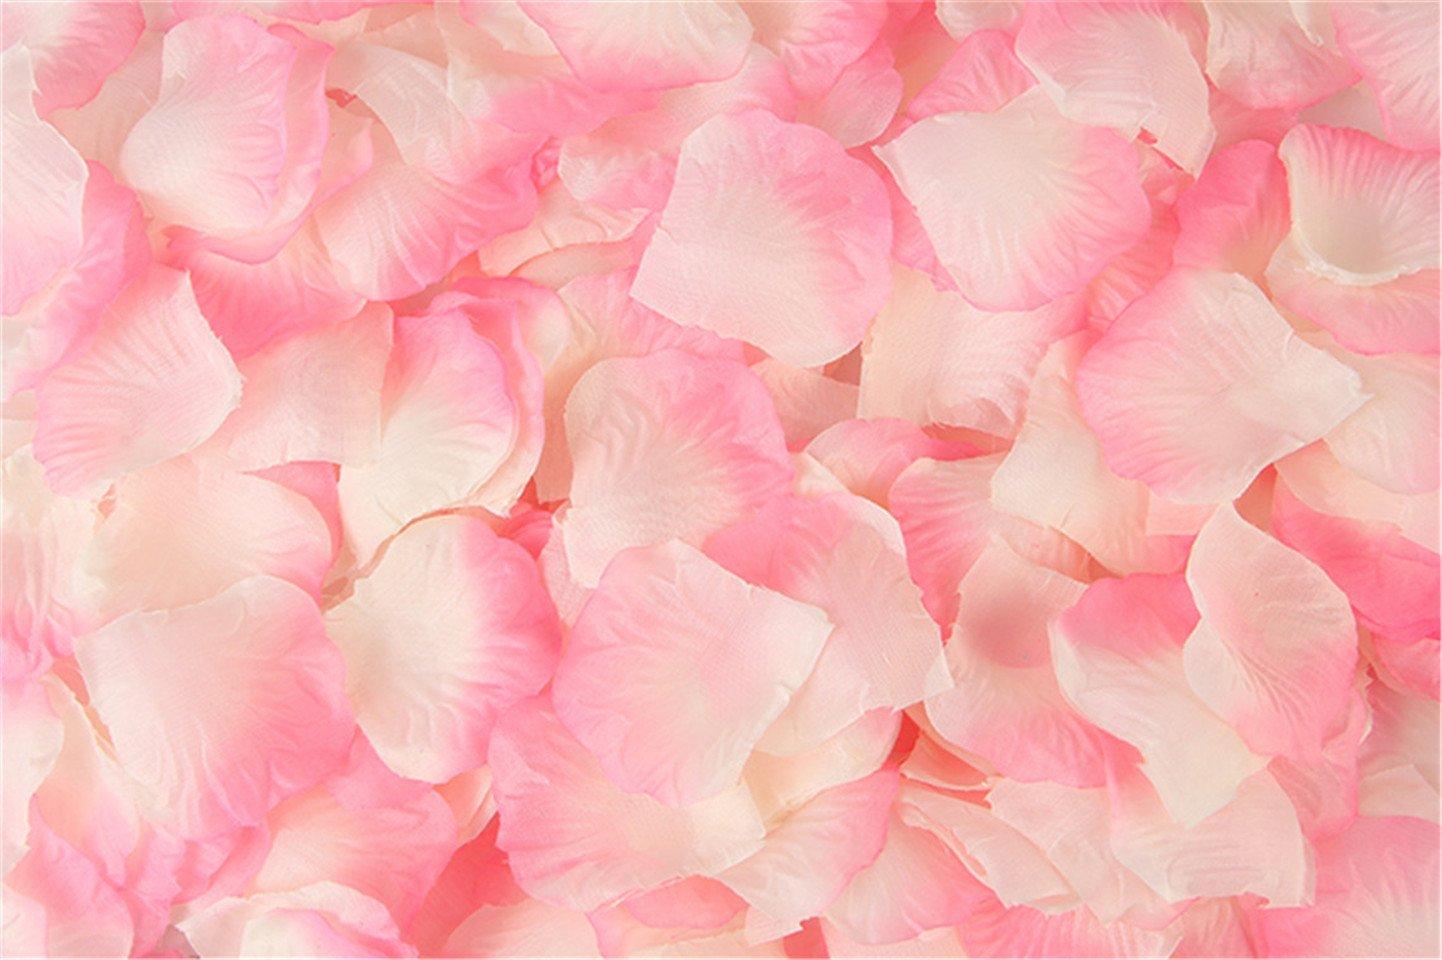 Vivianbuy 5000ピース 人工シルクフラワー レッドローズ花びら ウェディングパーティー ブライダルデコレーション用 B035-24 B07GWXH9DV Pink With White